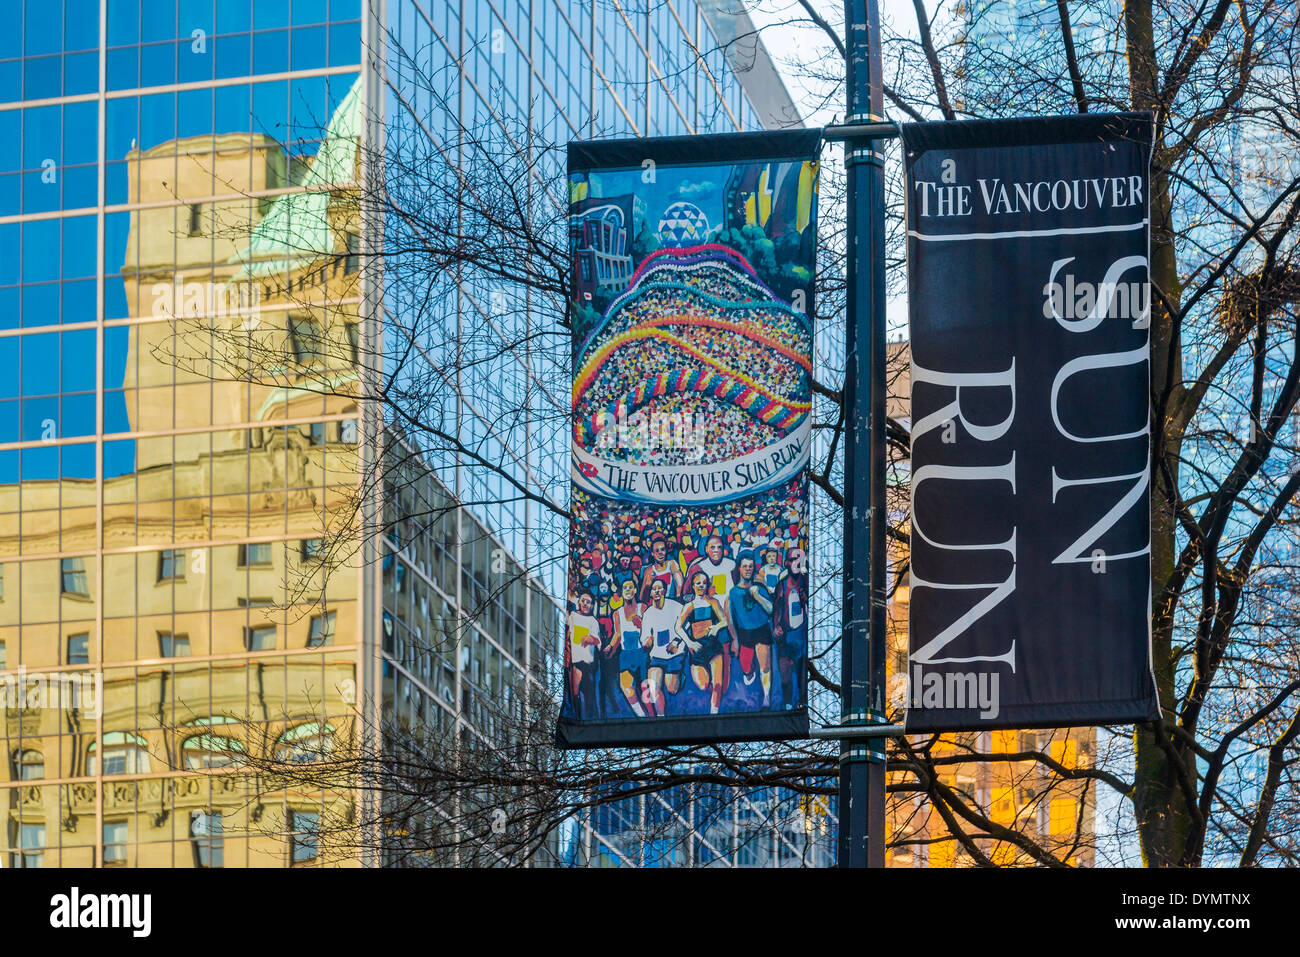 Vancouver Sun Run banners, Vancouver, British Columbia, Canada - Stock Image